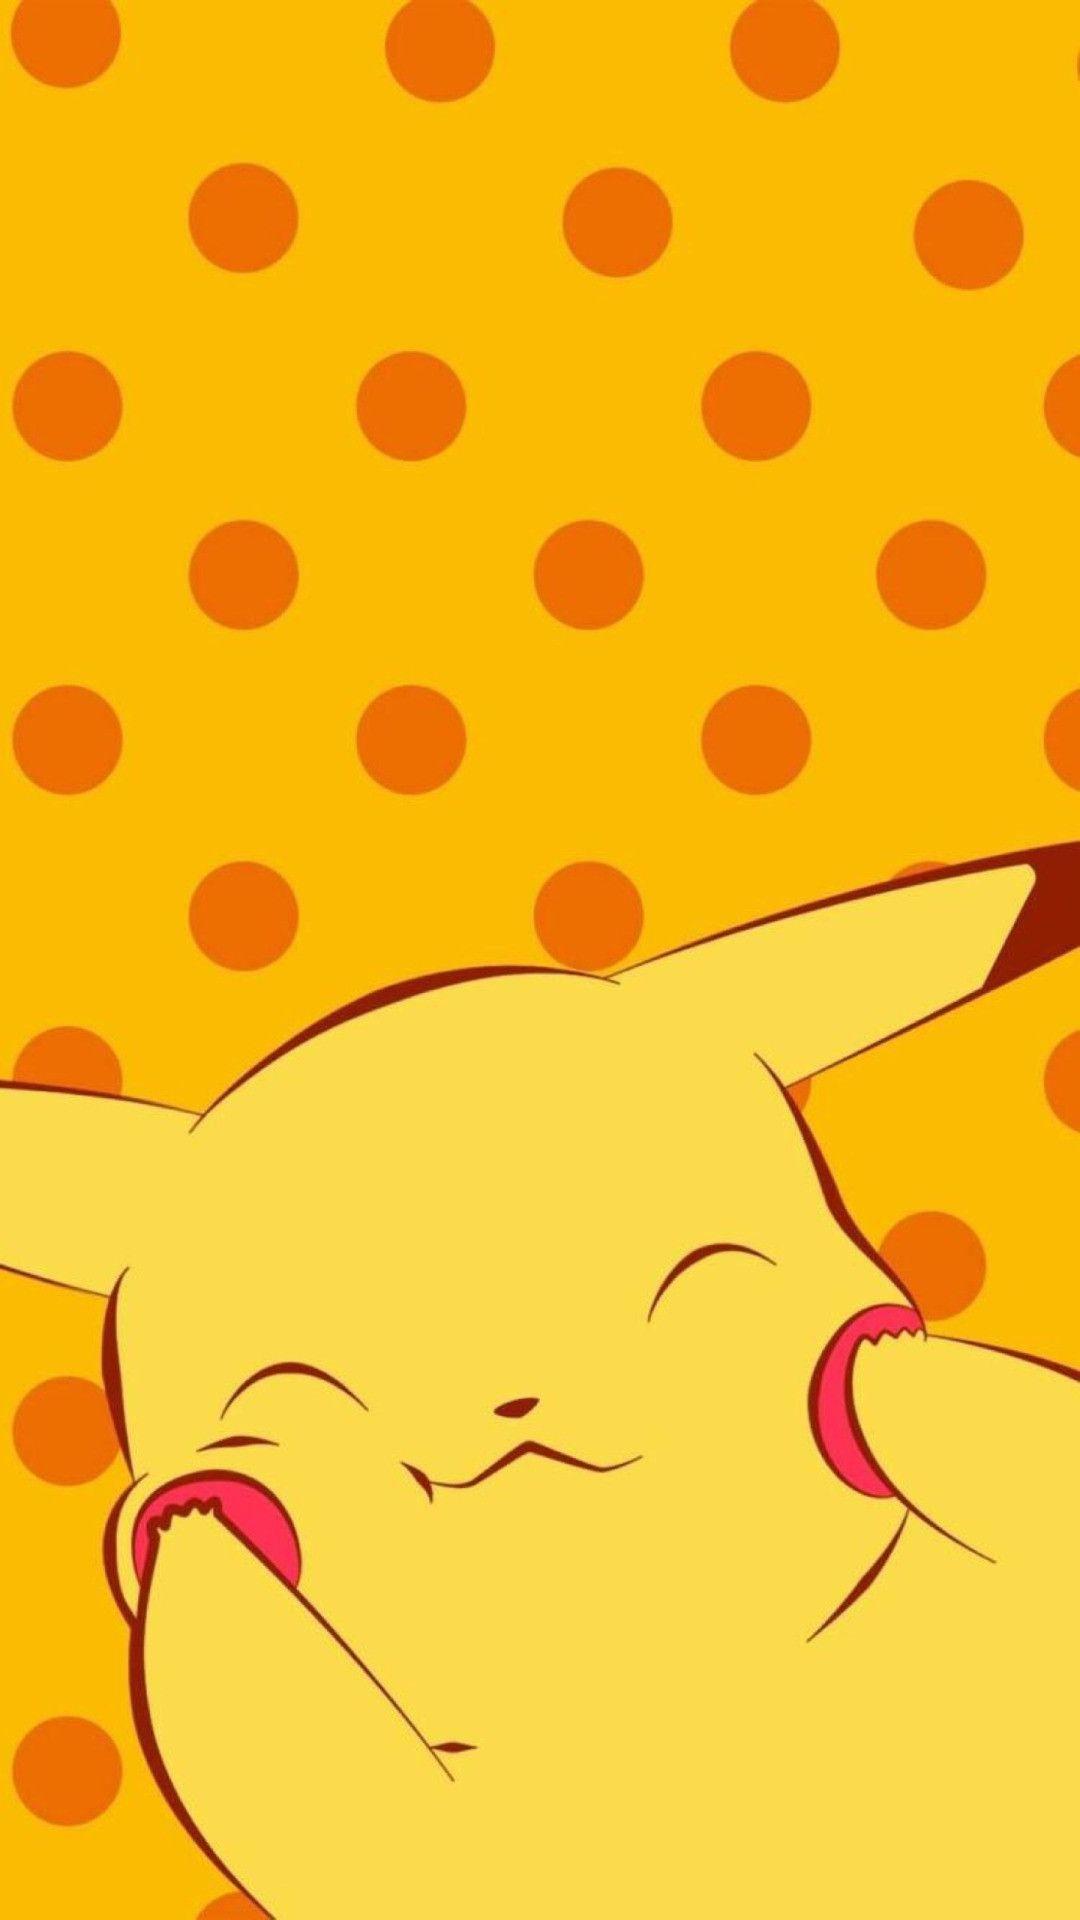 Pokemon Cool iOS 7 wallpaper